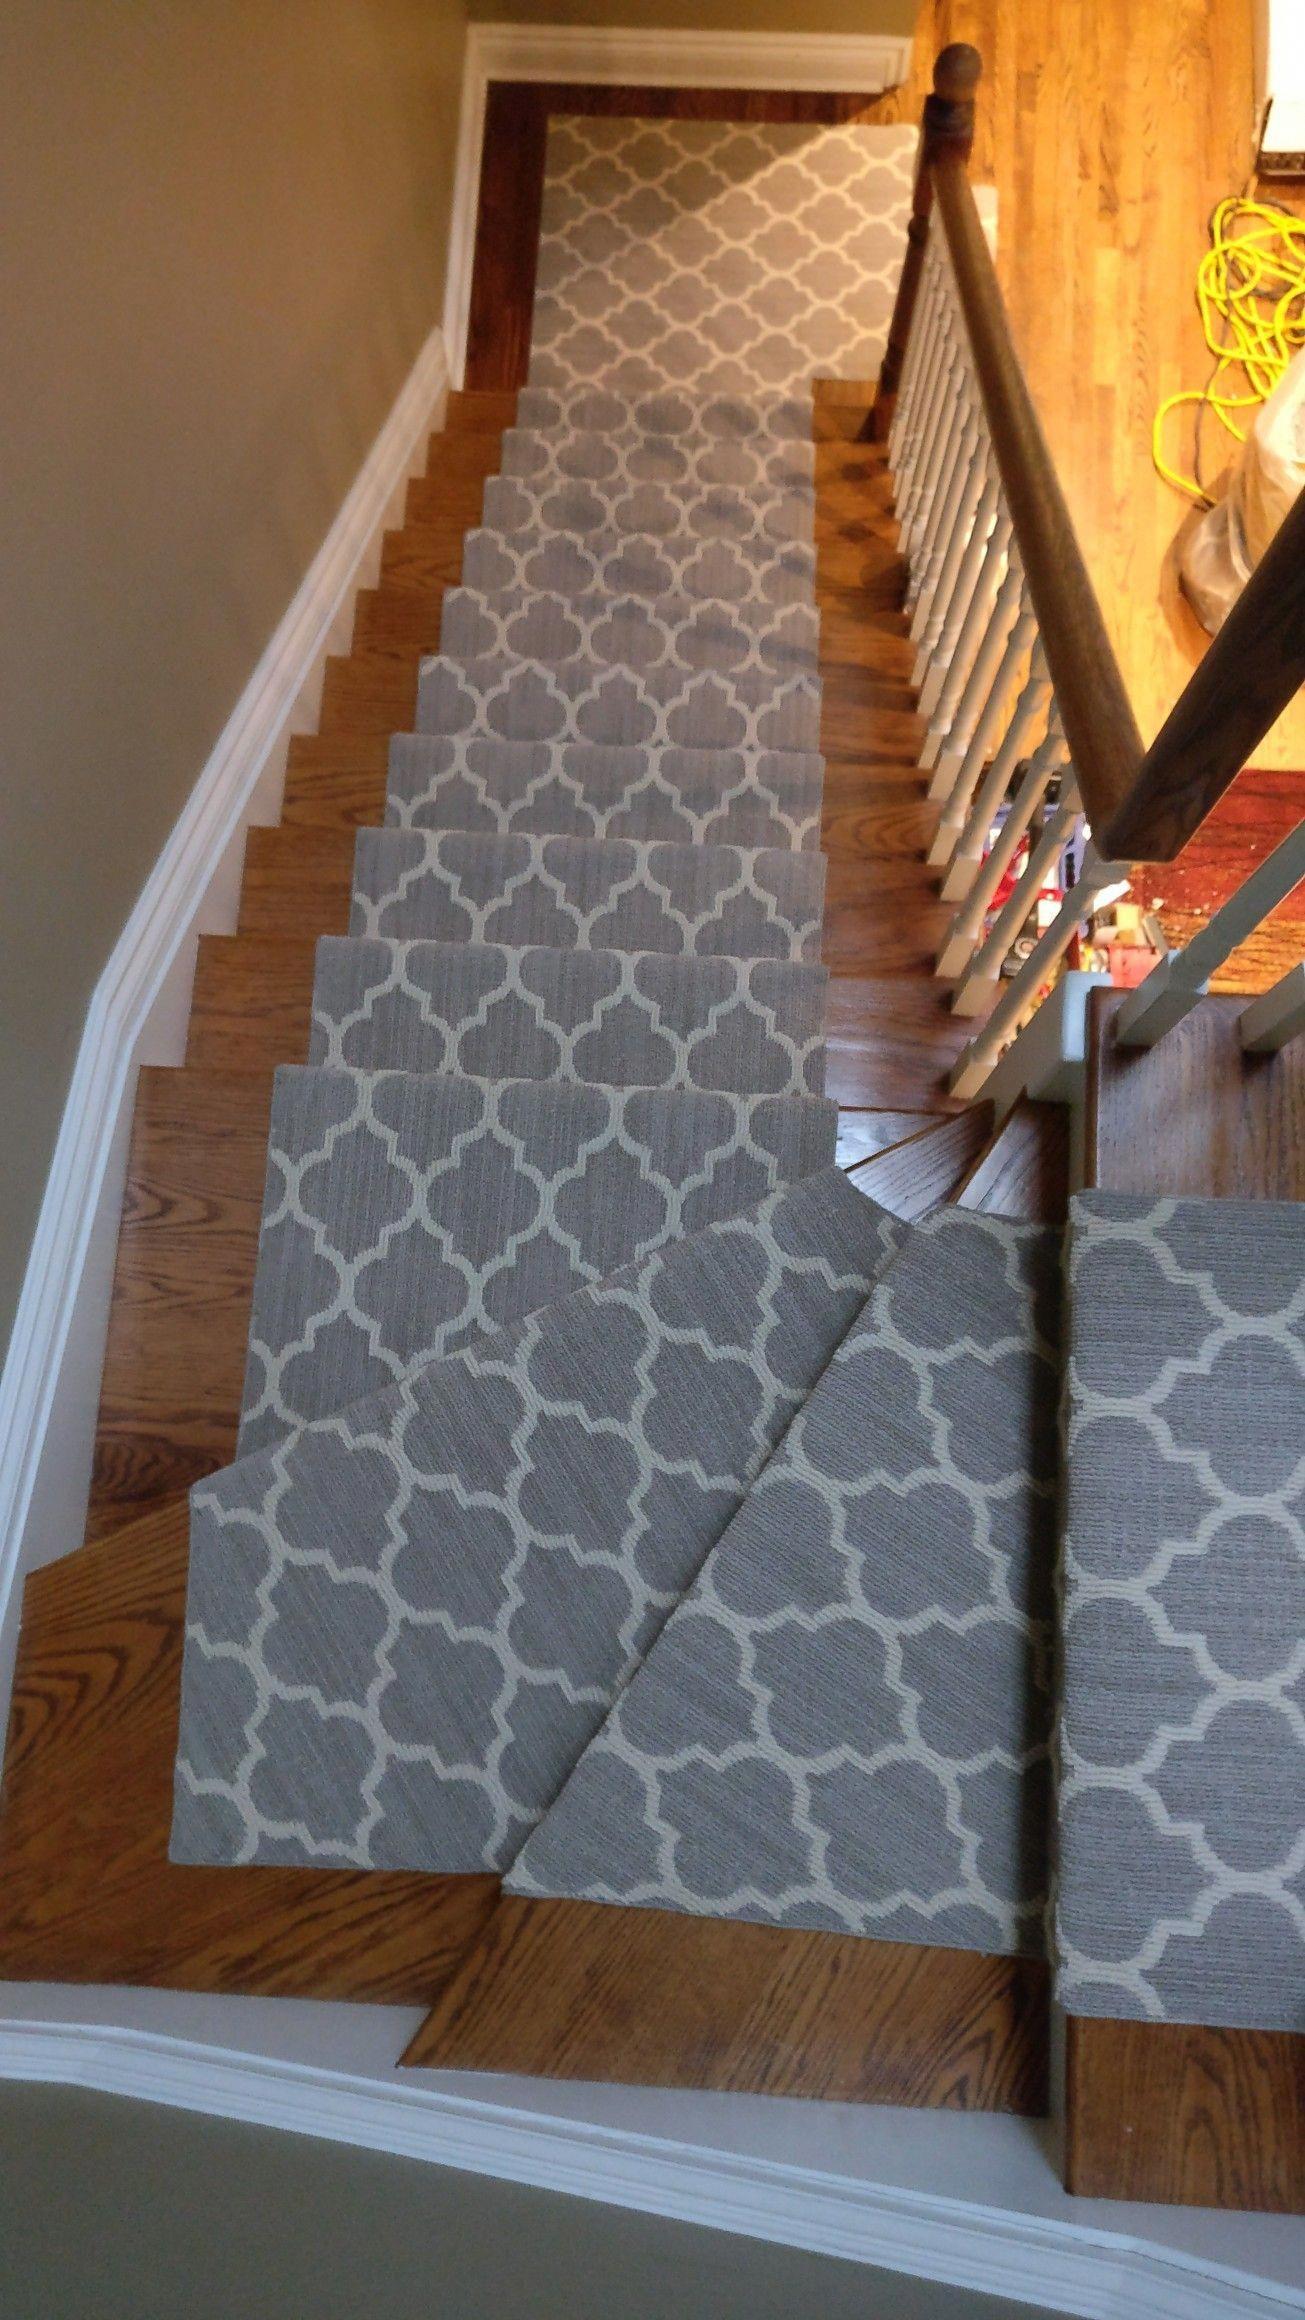 Howtocleancarpetrunners Carpetsluxury Hallway Carpet Runners Buying Carpet Stair Runner Carpet